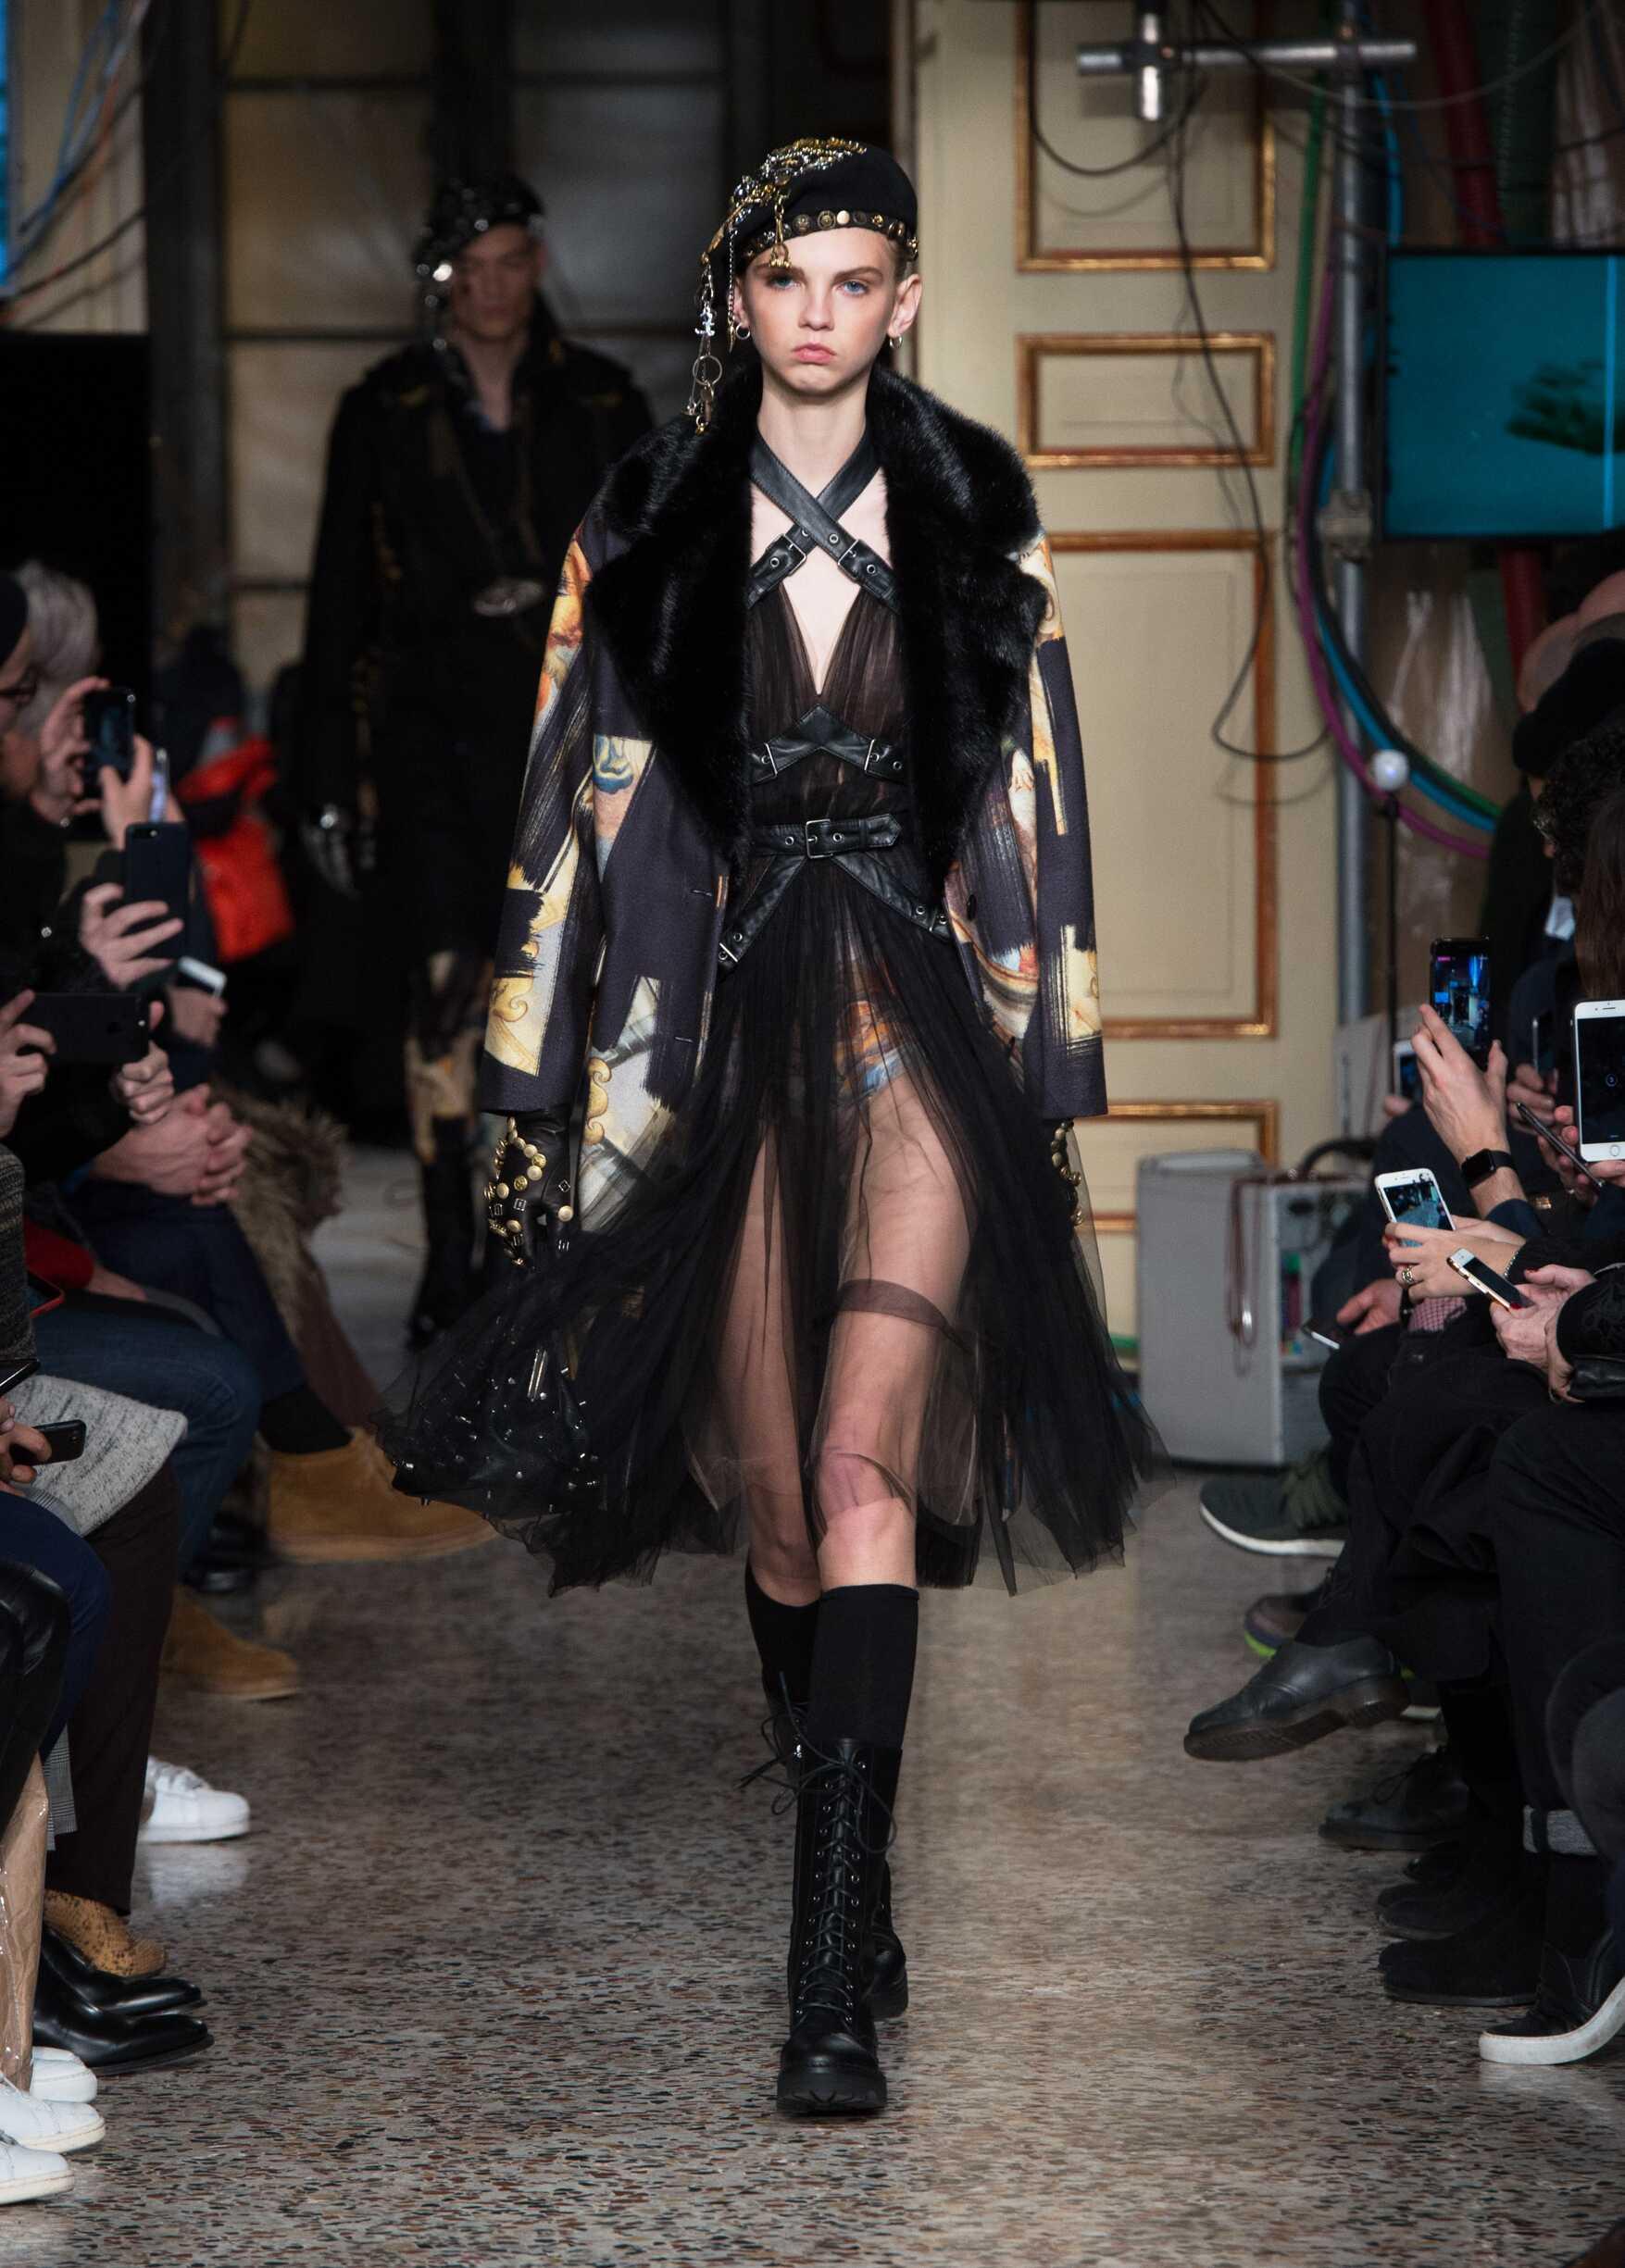 Fall Winter Fashion Trends Woman 2017-18 Moschino